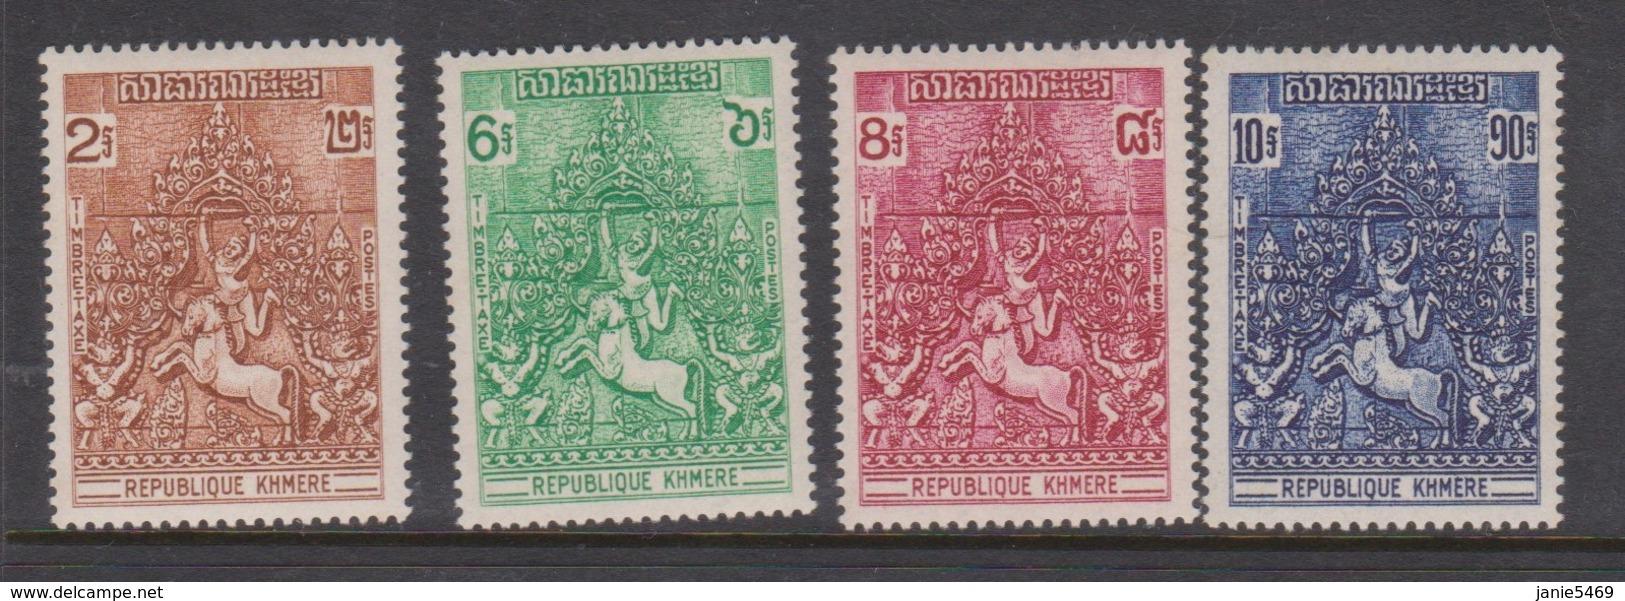 Cambodia Scott J6-J9 1974 Postage Due,mint Never Hinged - Cambodia